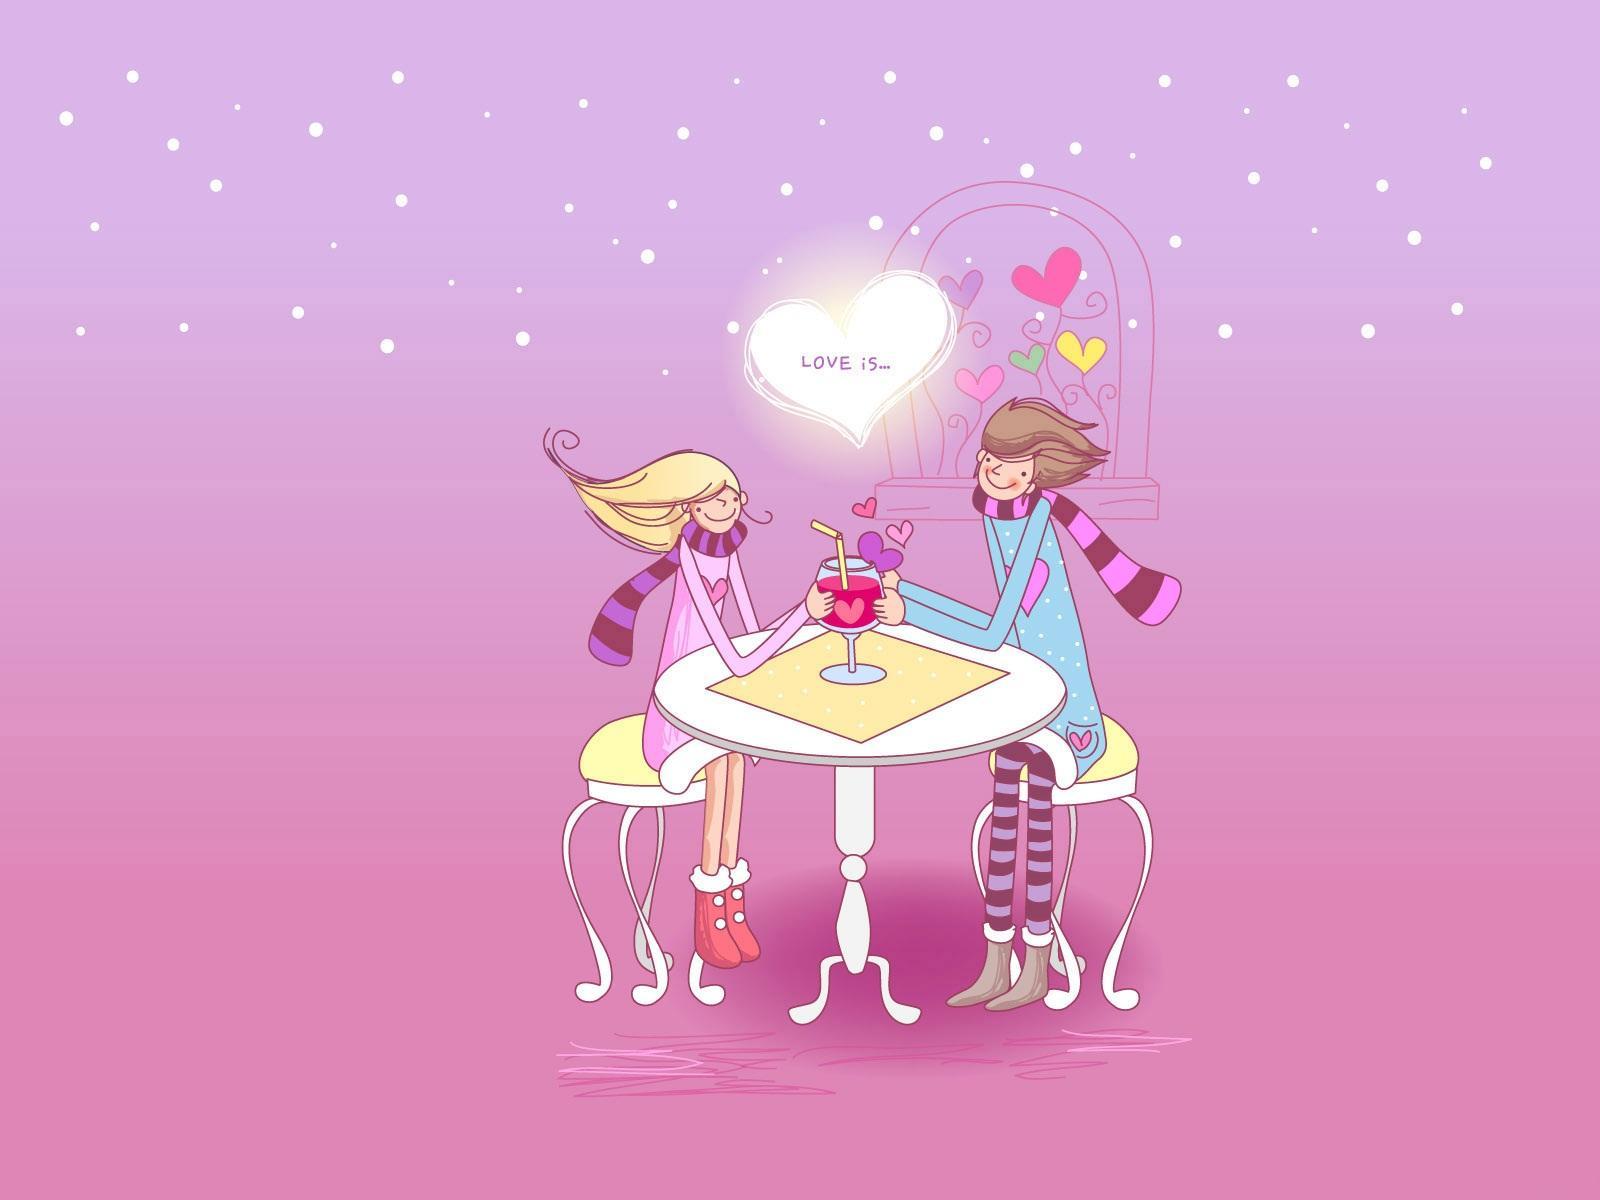 Girl Boy Love Birds Wallpaper Download Girly Wallpapers Hd Free Download Pixelstalk Net